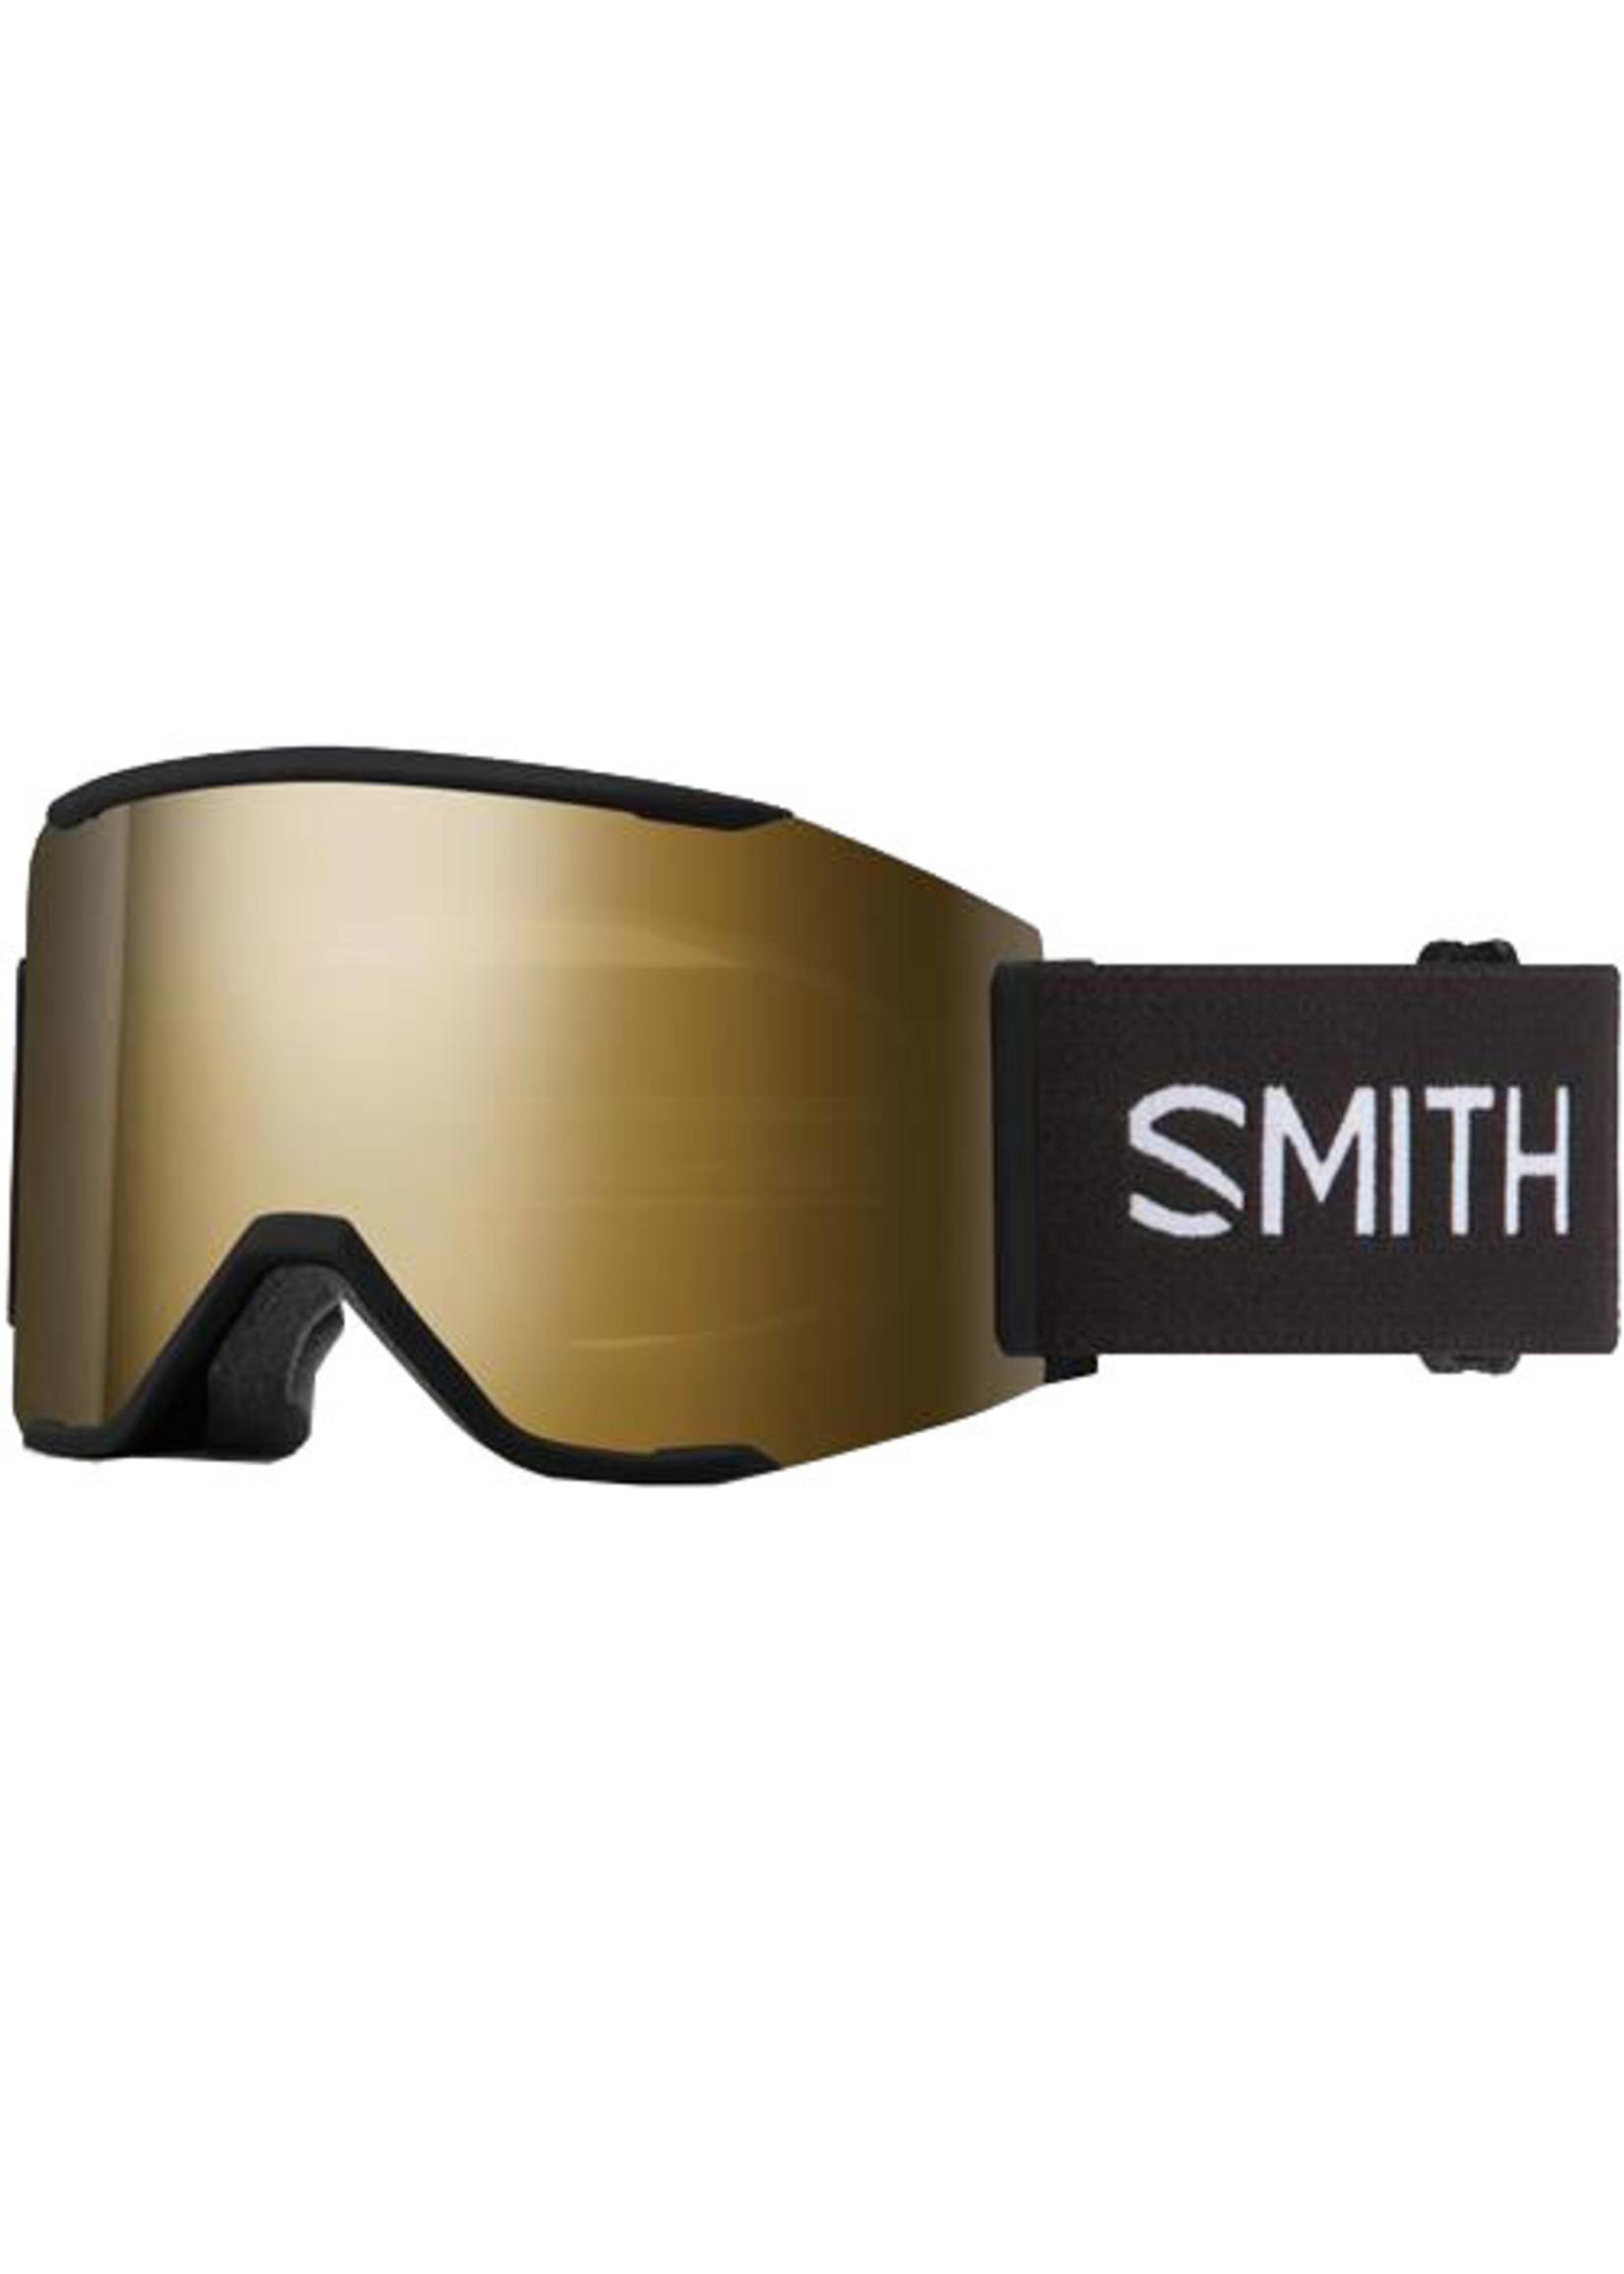 SMITH SQUAD MAG BLACK CHROMAPOP SUN BLACK GOLD MIRROR LUNETTE